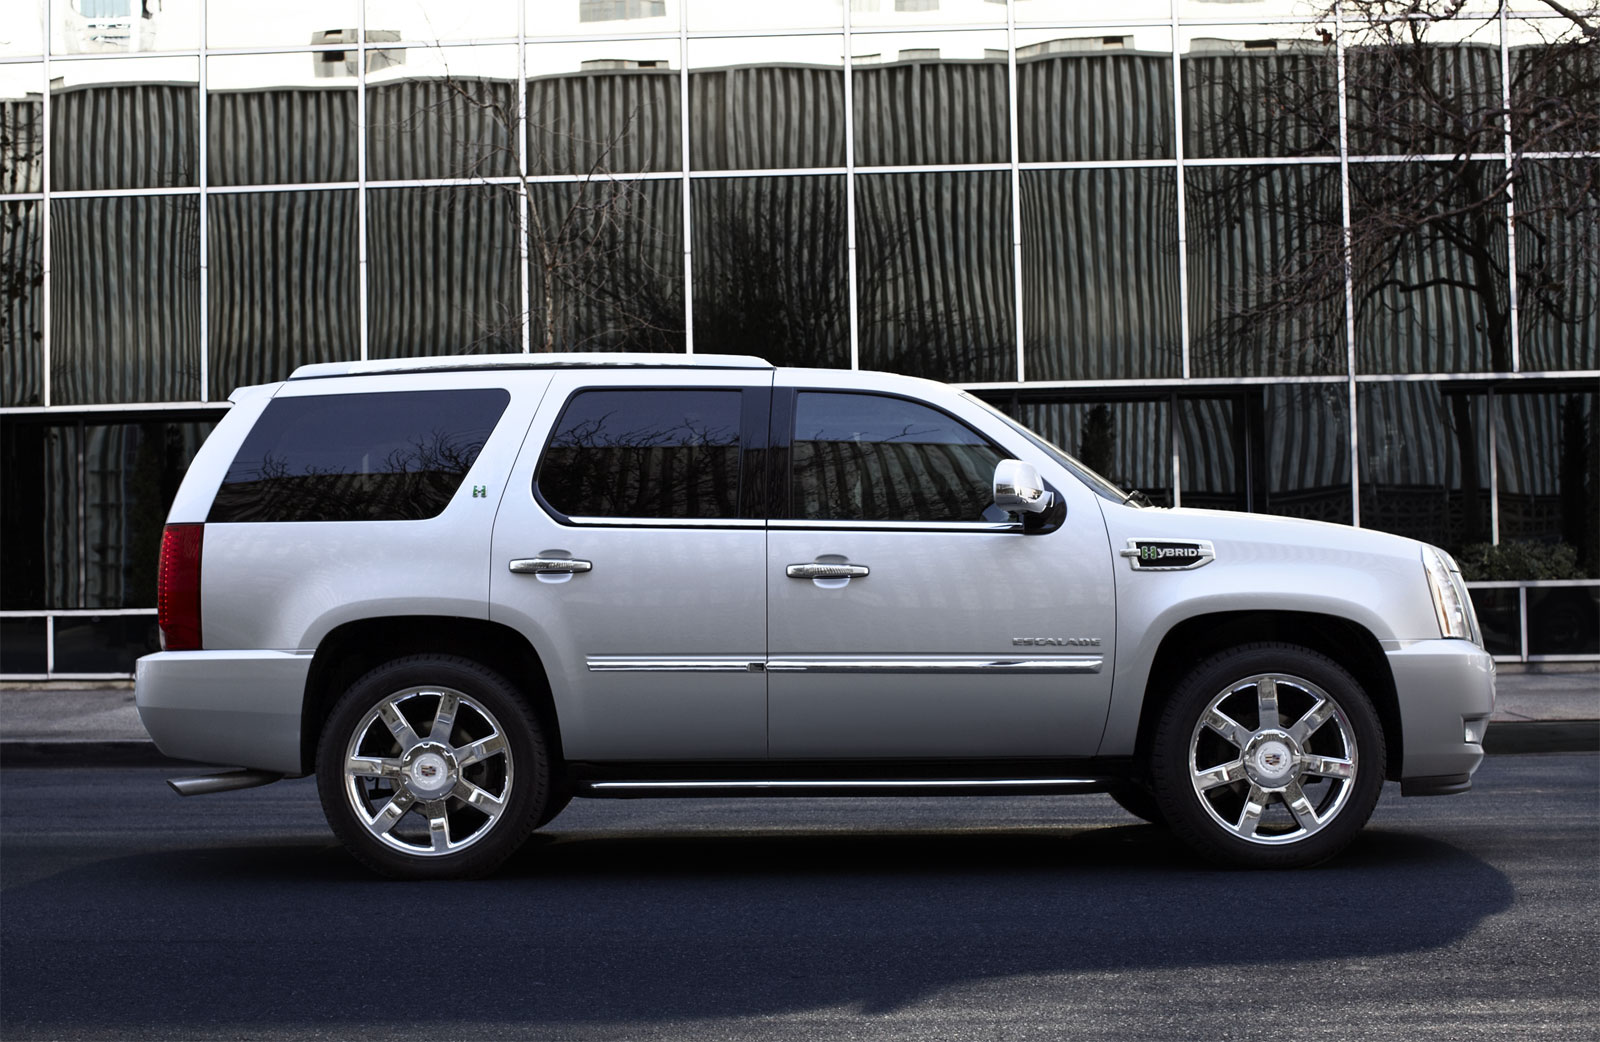 2012 cadillac escalade hybrid best hybrid cars blackcarracing. Black Bedroom Furniture Sets. Home Design Ideas